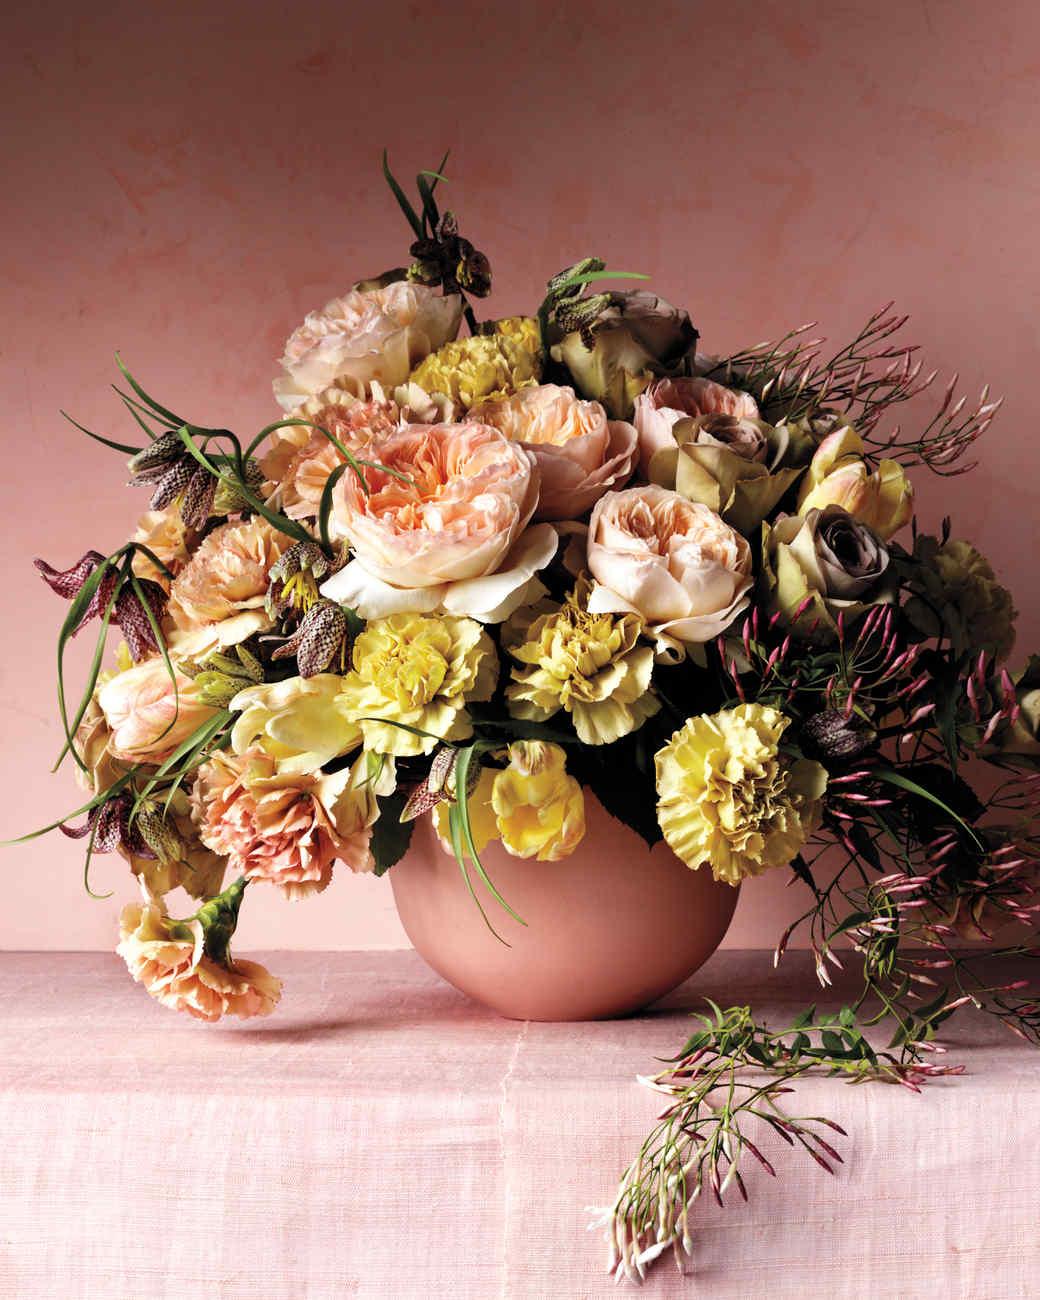 carnations-flower-arrangement-v2-d-comp-d111001.jpg